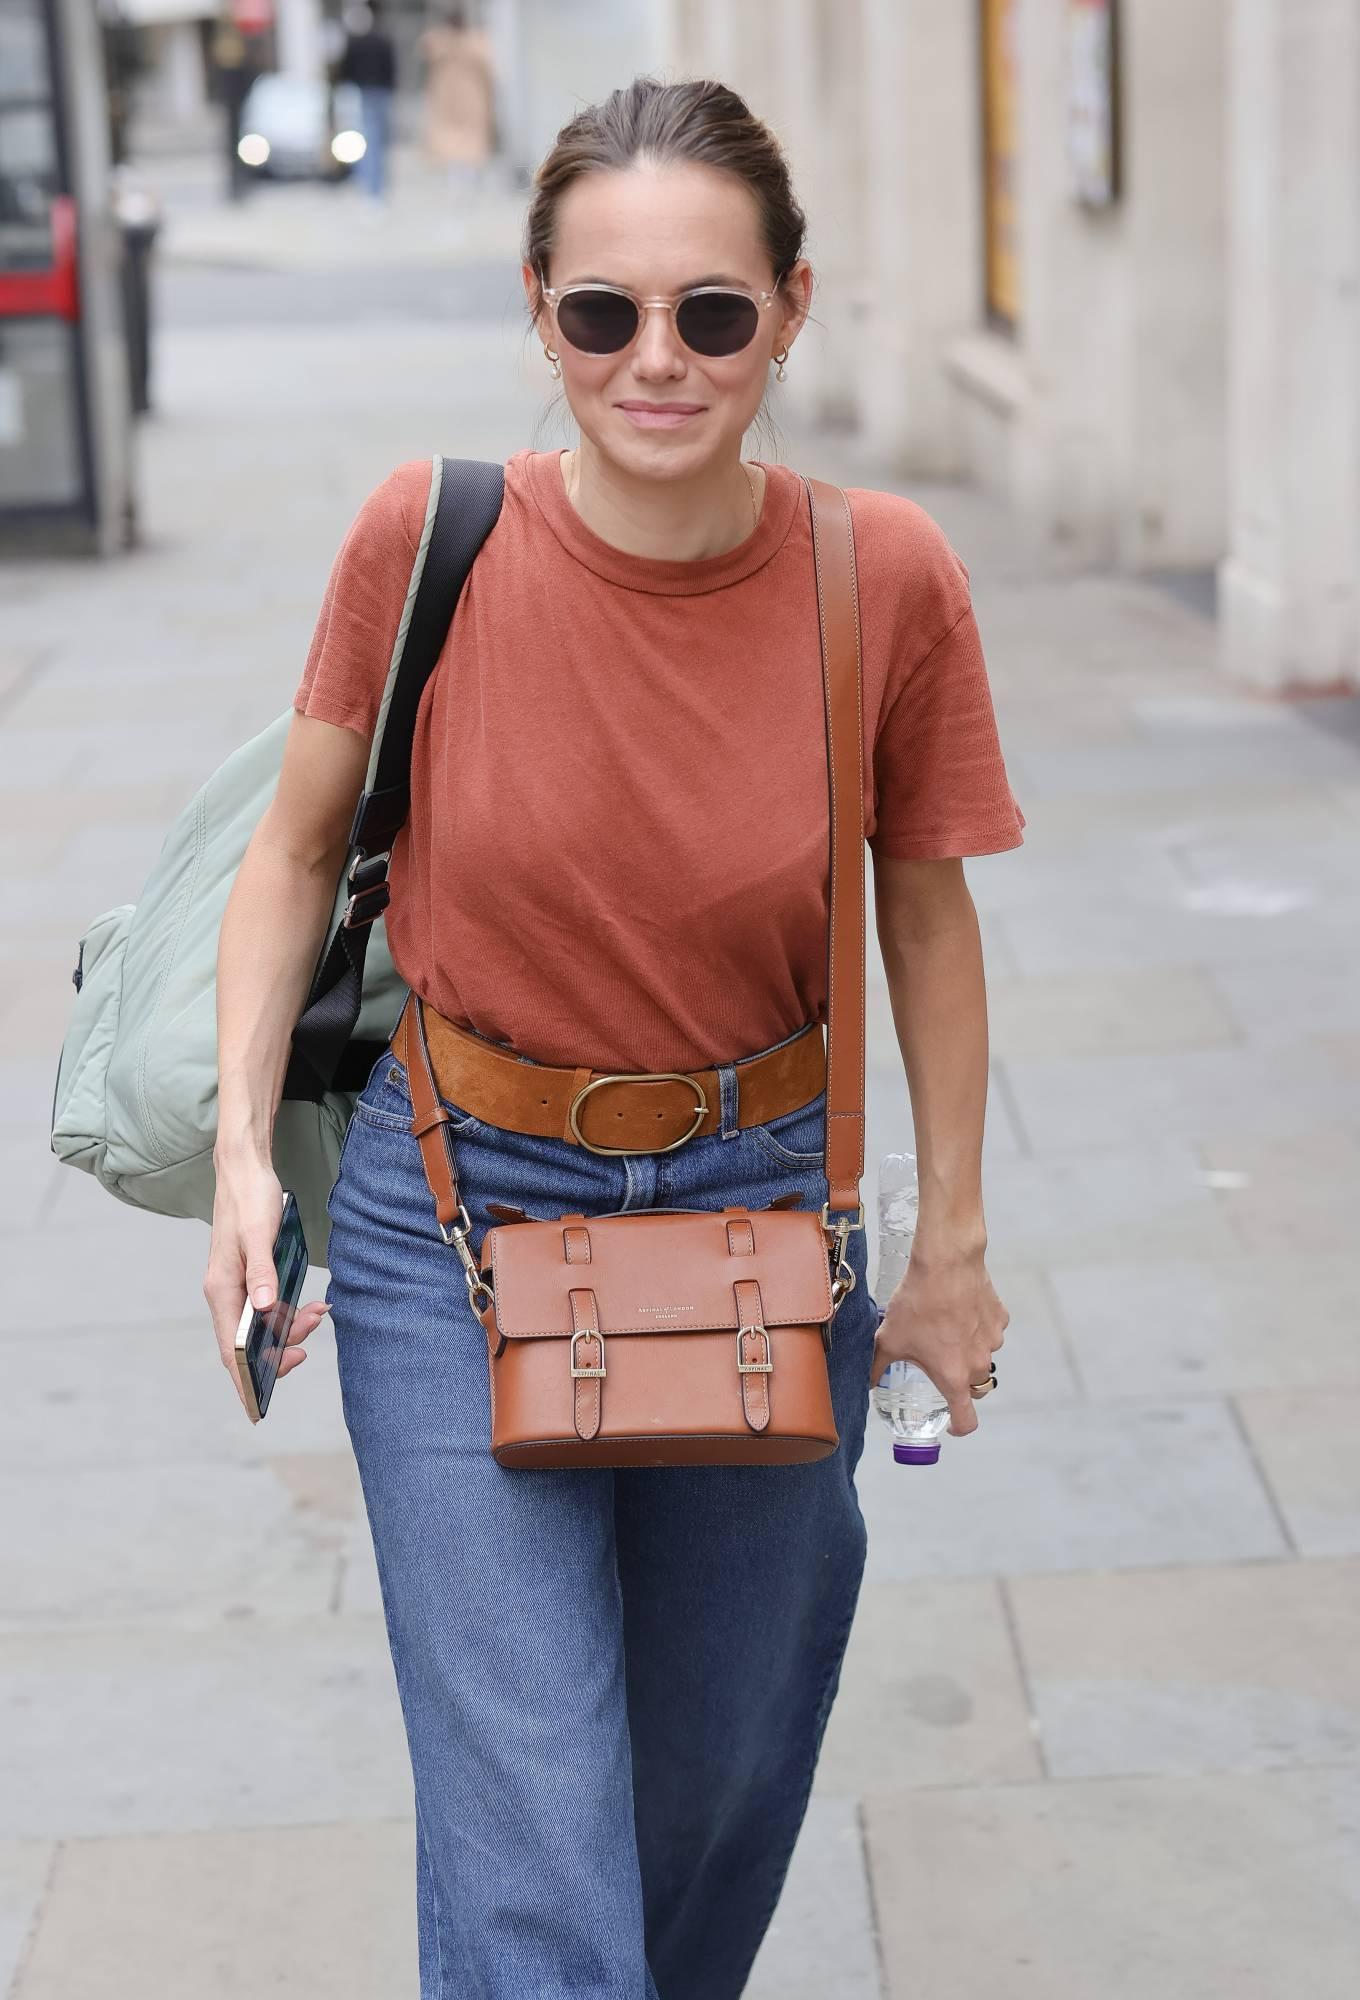 Kara Tointon 2021 : Kara Tointon – In flared denim pants stepping out in London-09